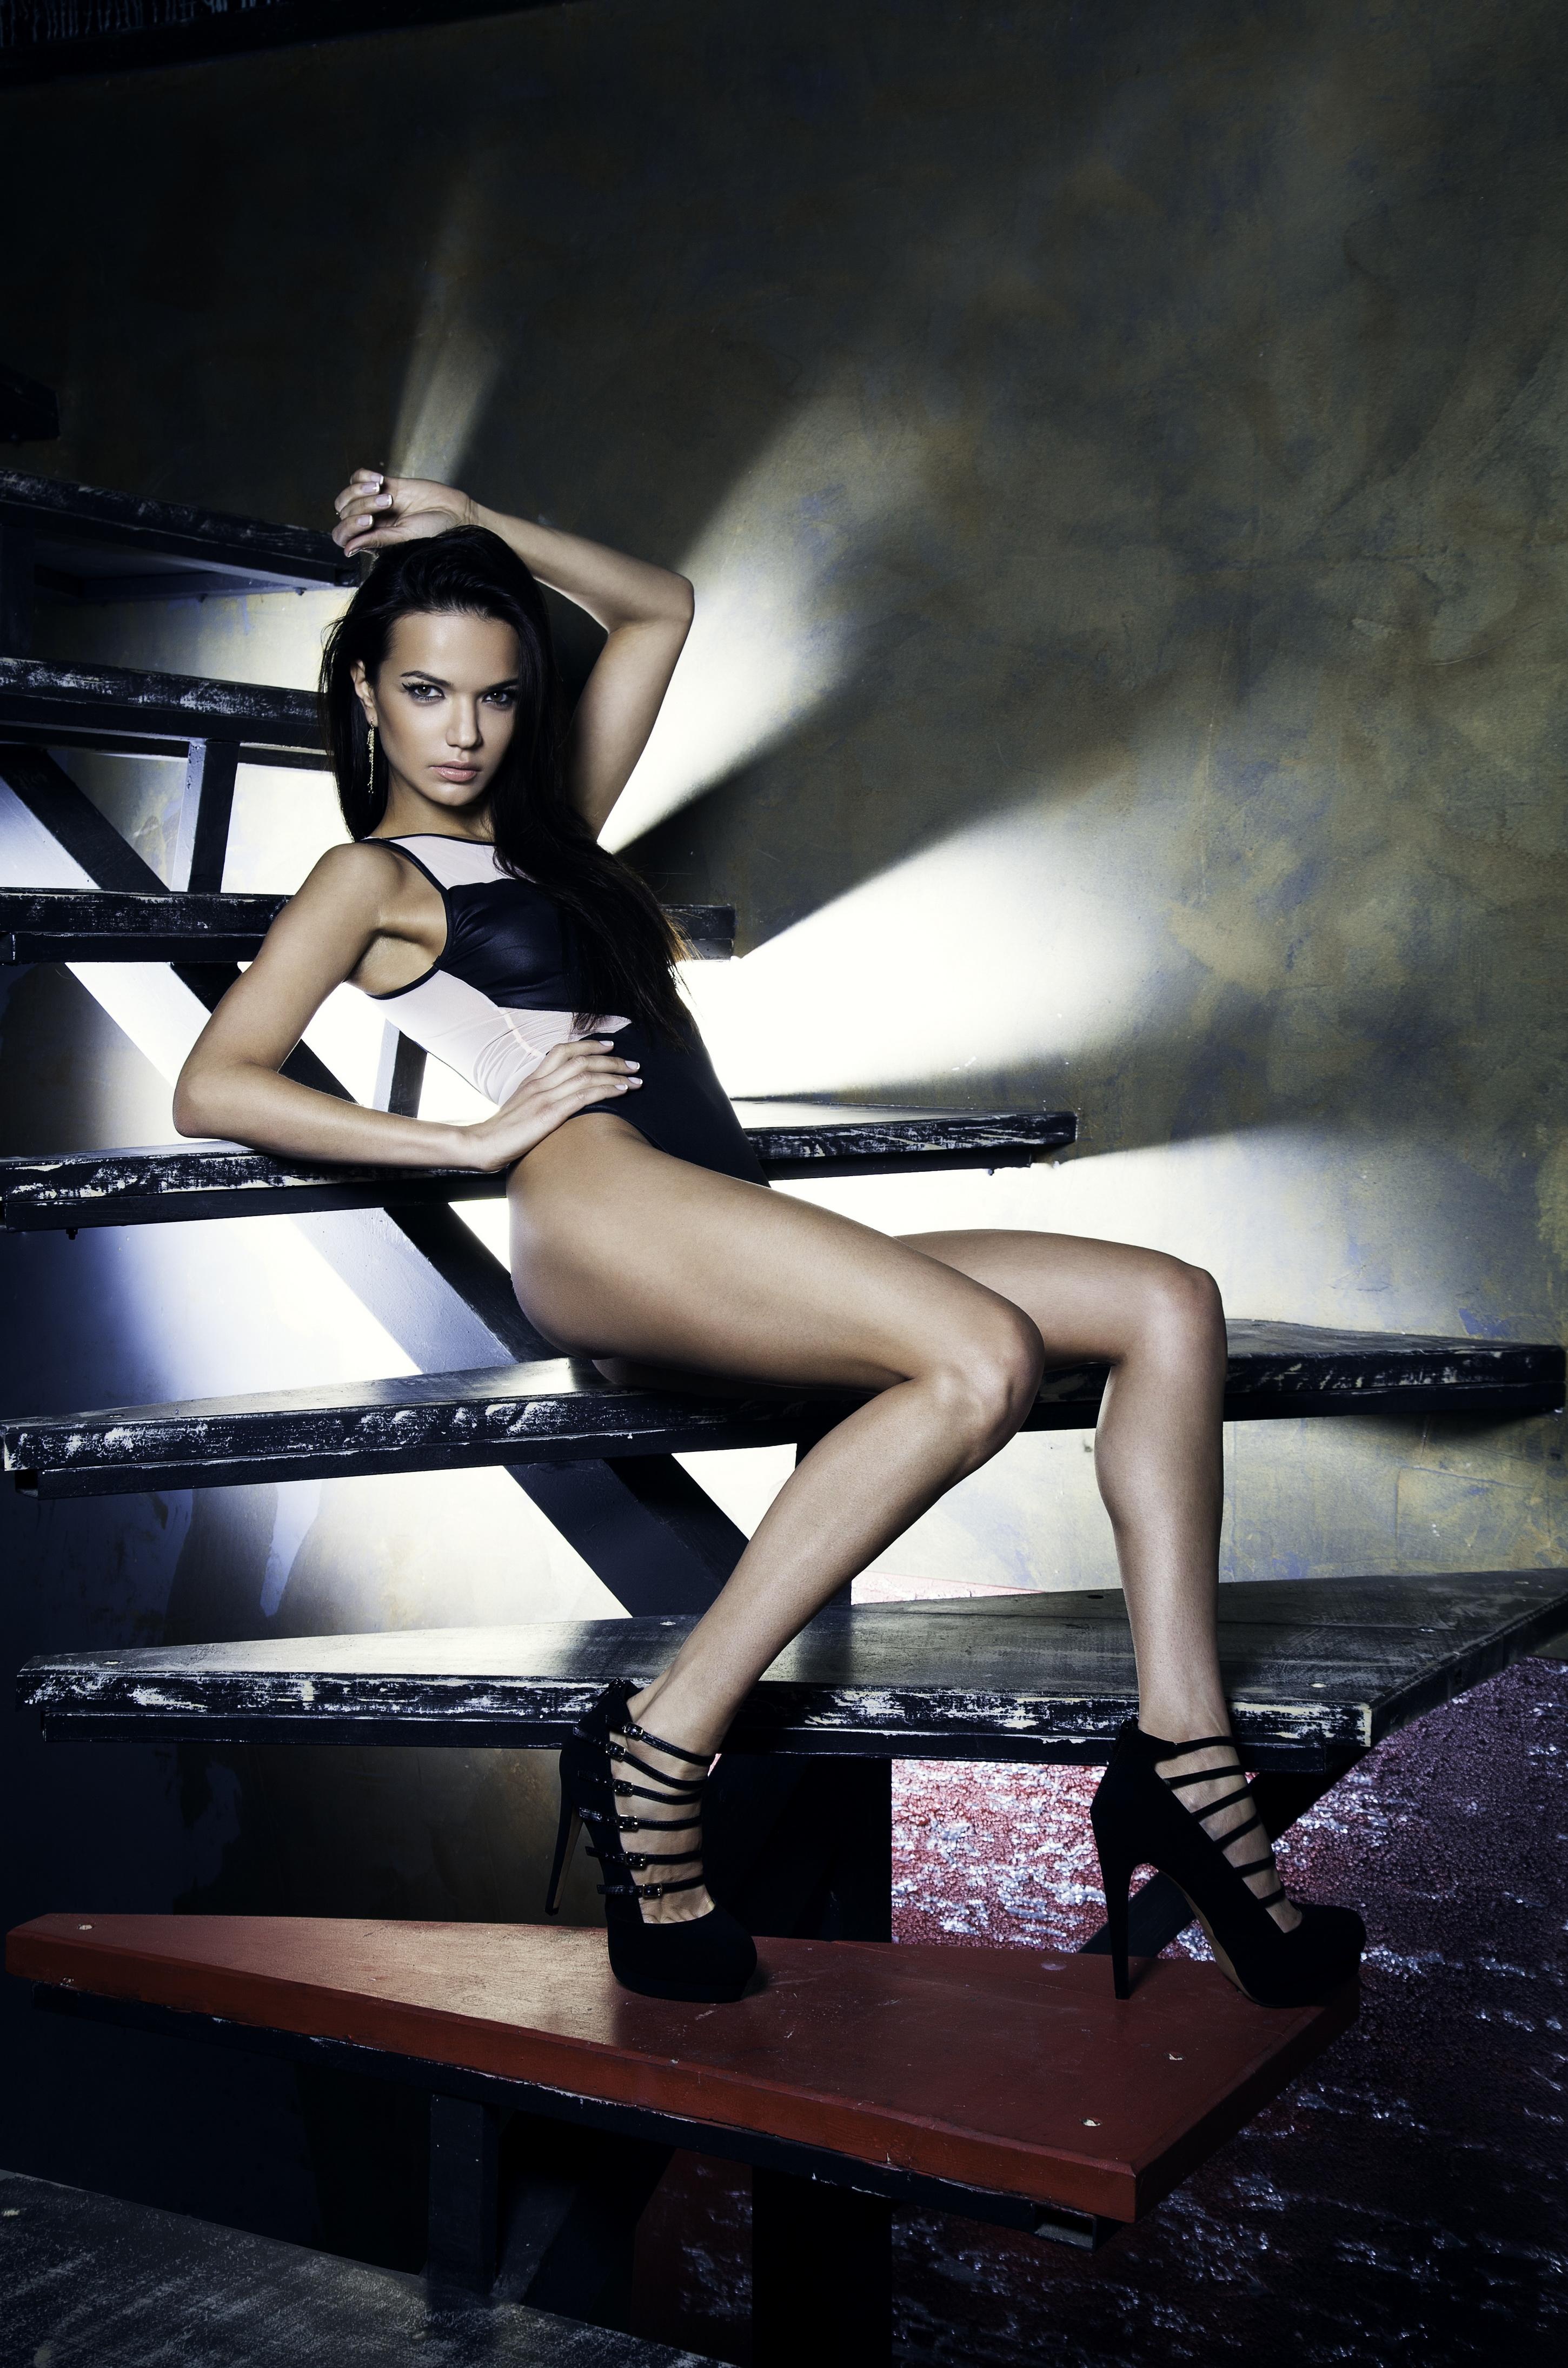 Аделина Шарипова. Фото сессия для журнала MAN TREND